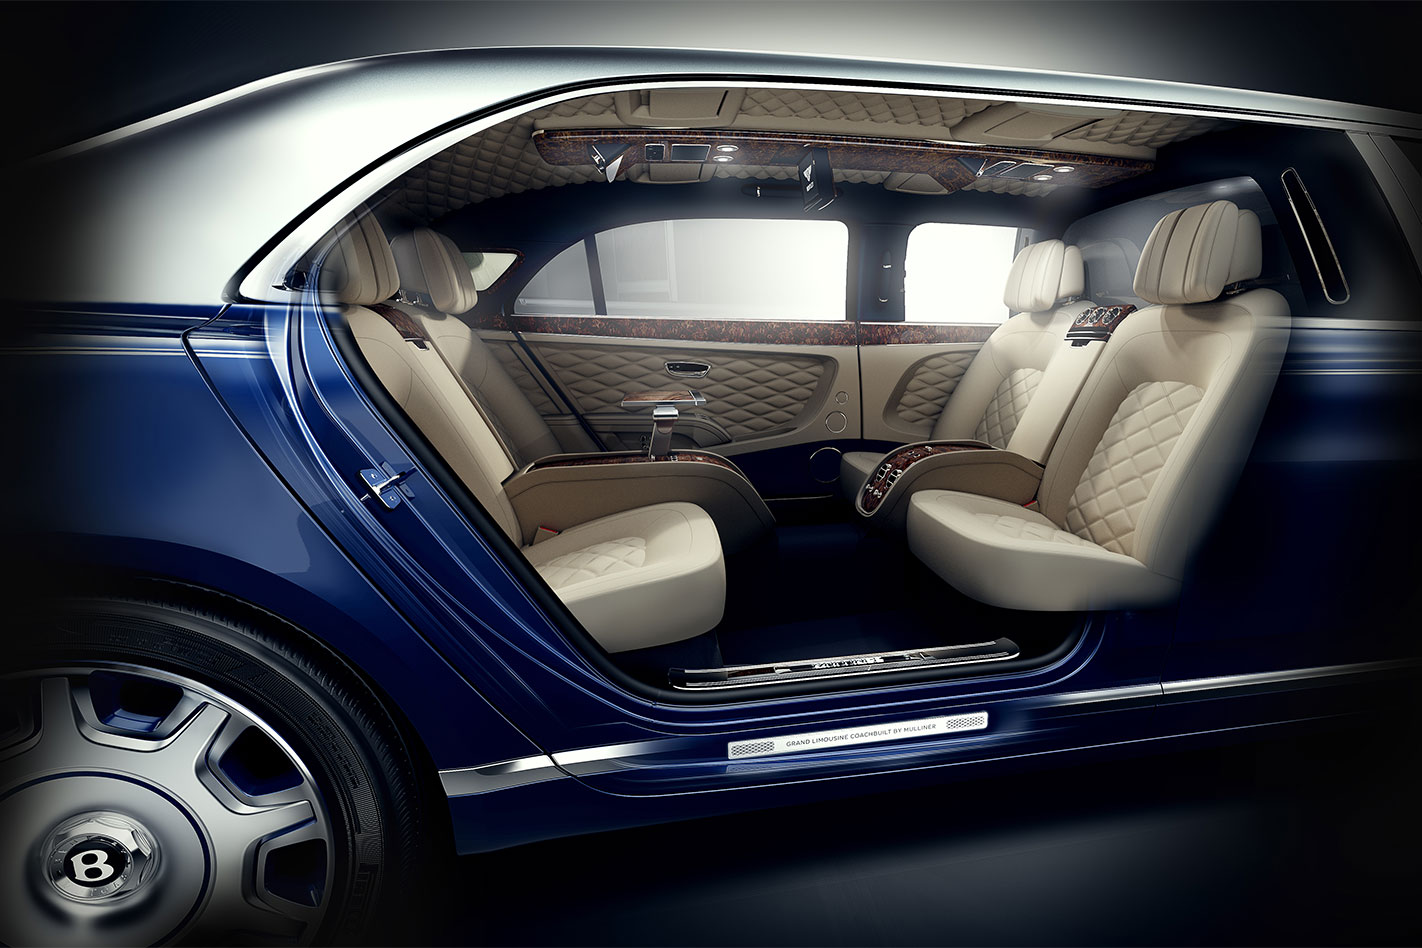 Bentley -Mulsanne -Grand -Limousine -interior